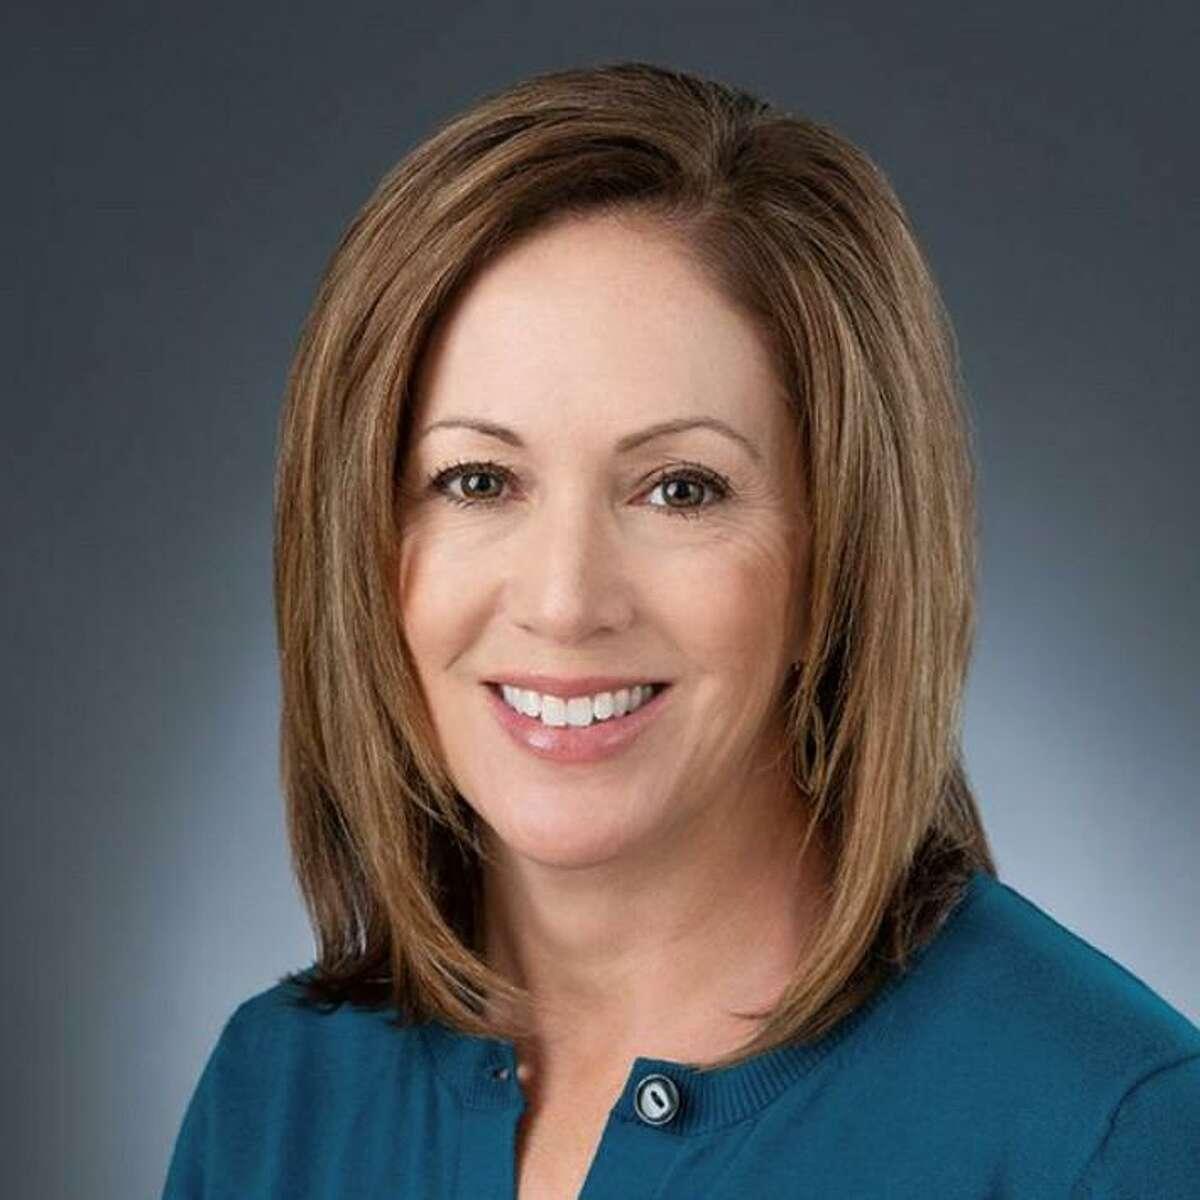 Nicole Moraw is the new executive director of ARTreach